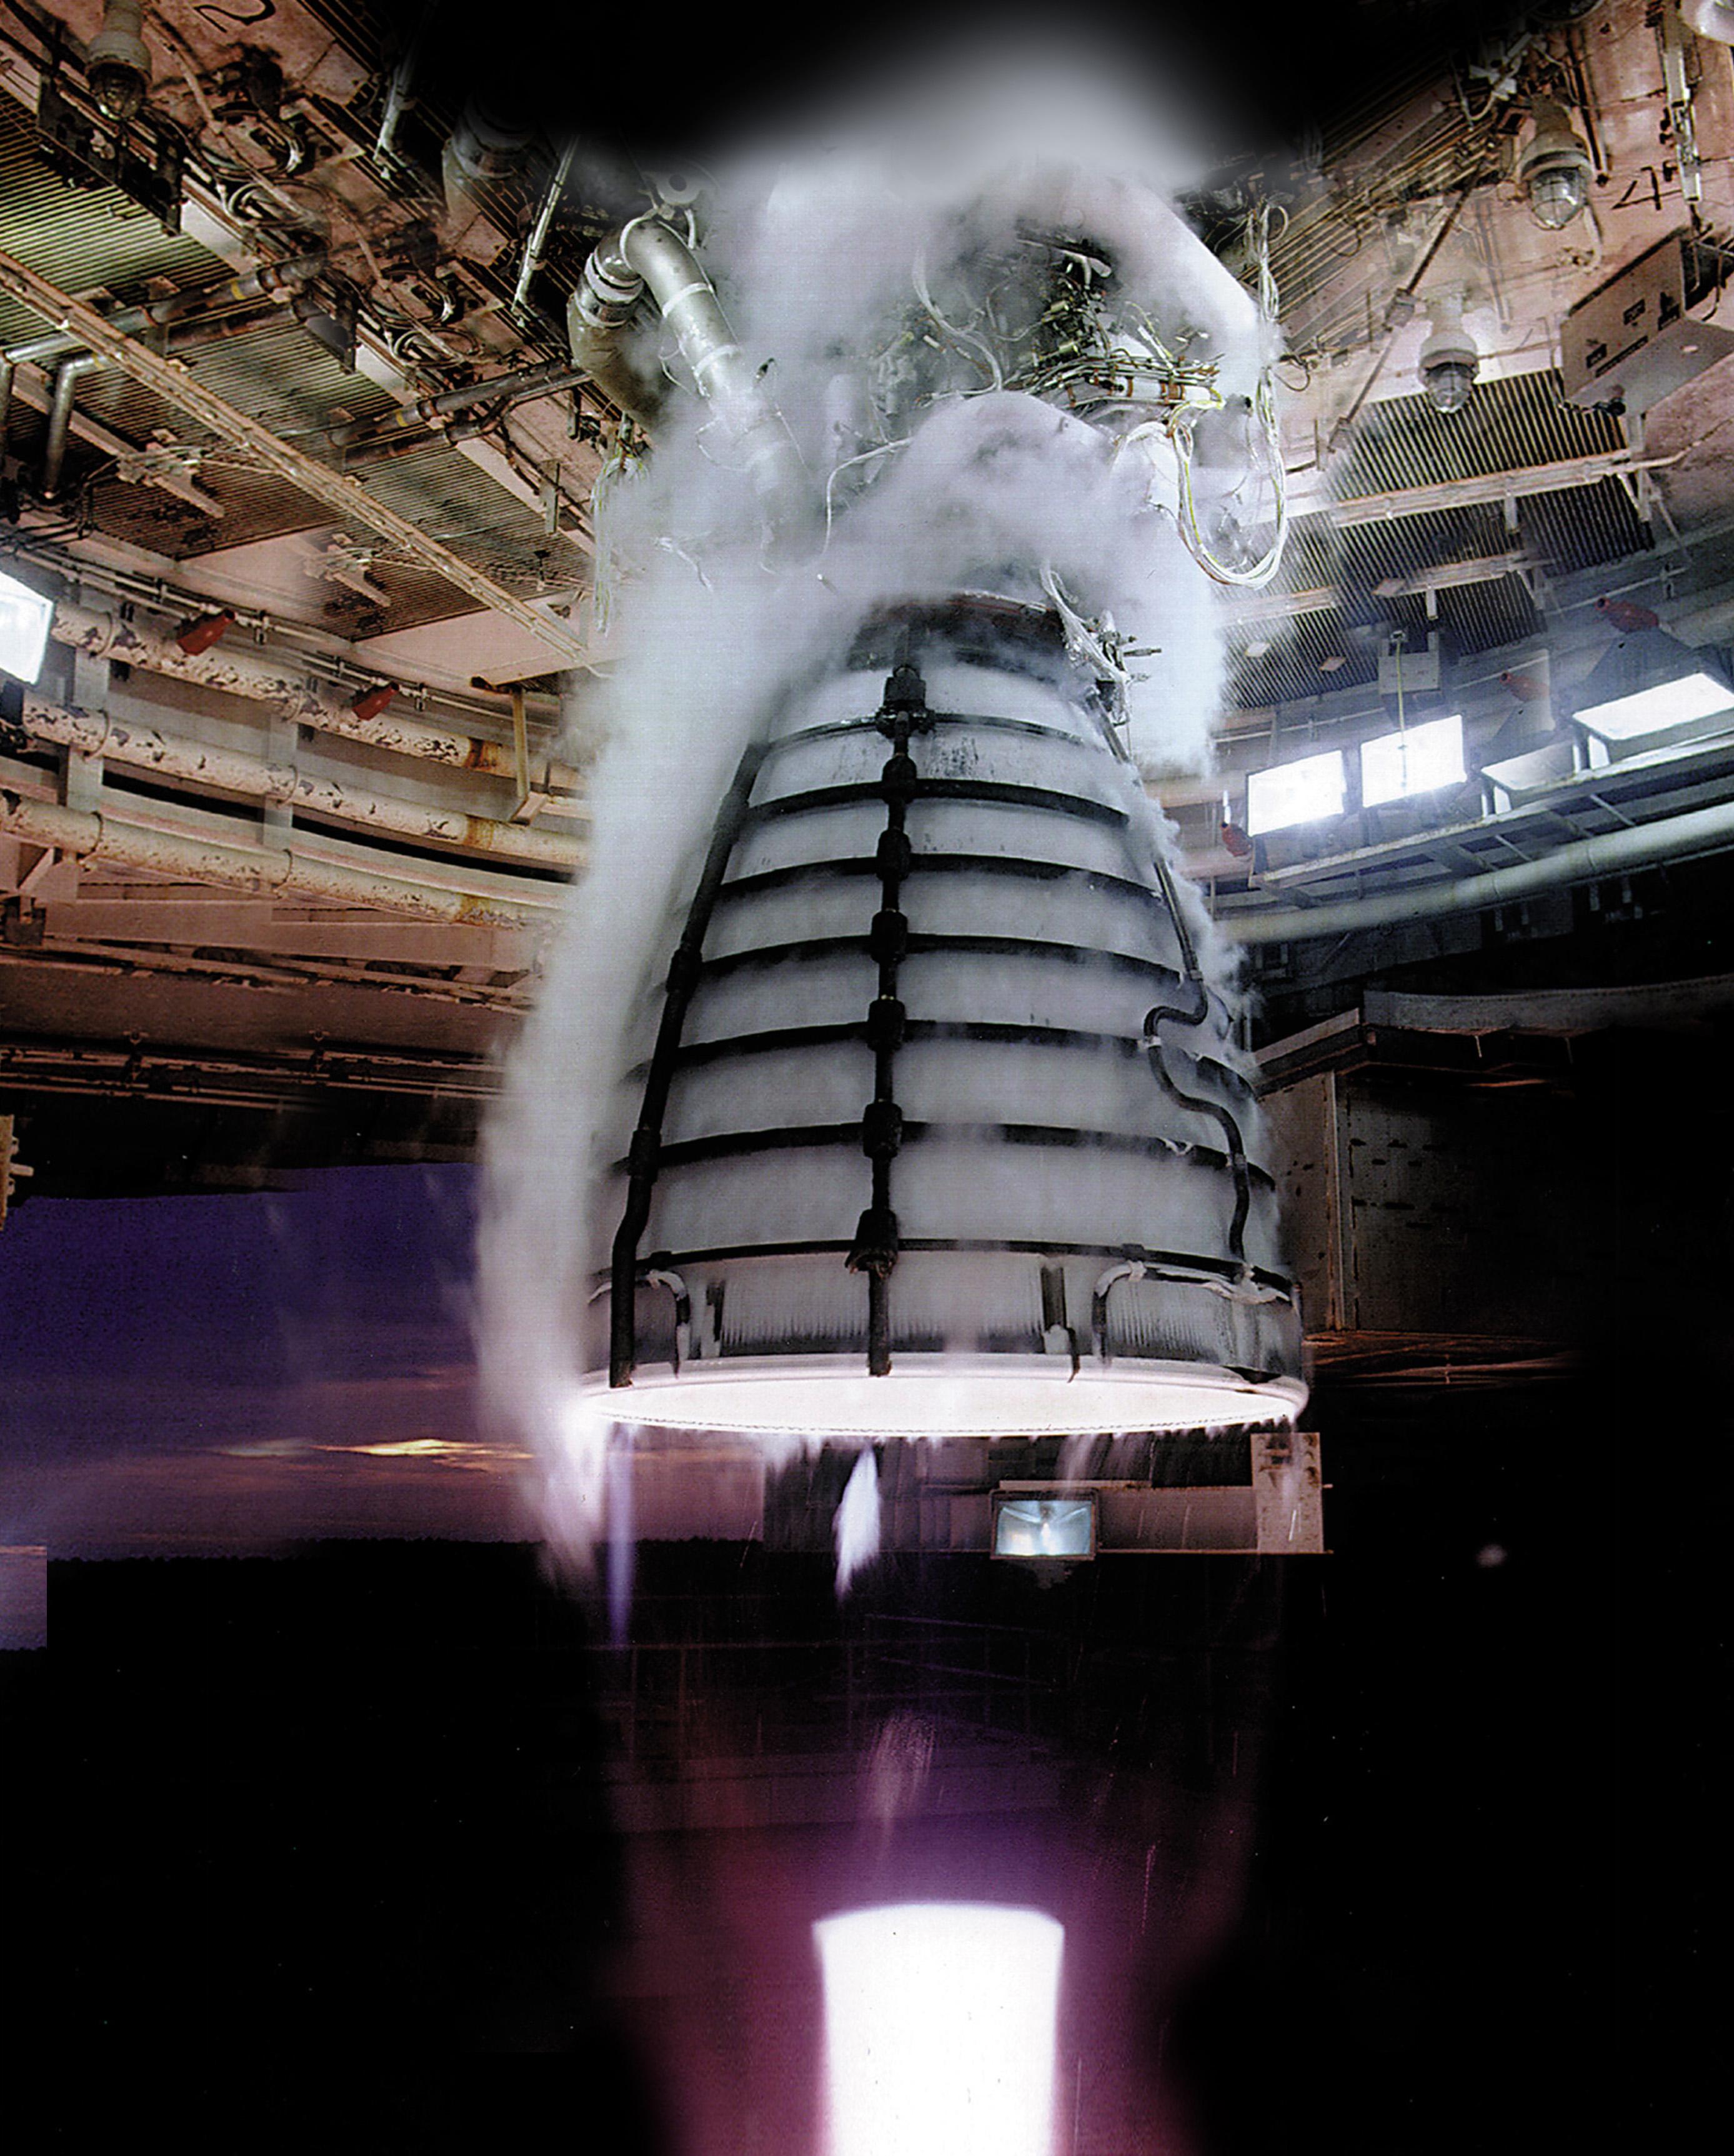 the core movie space shuttle landing - photo #29